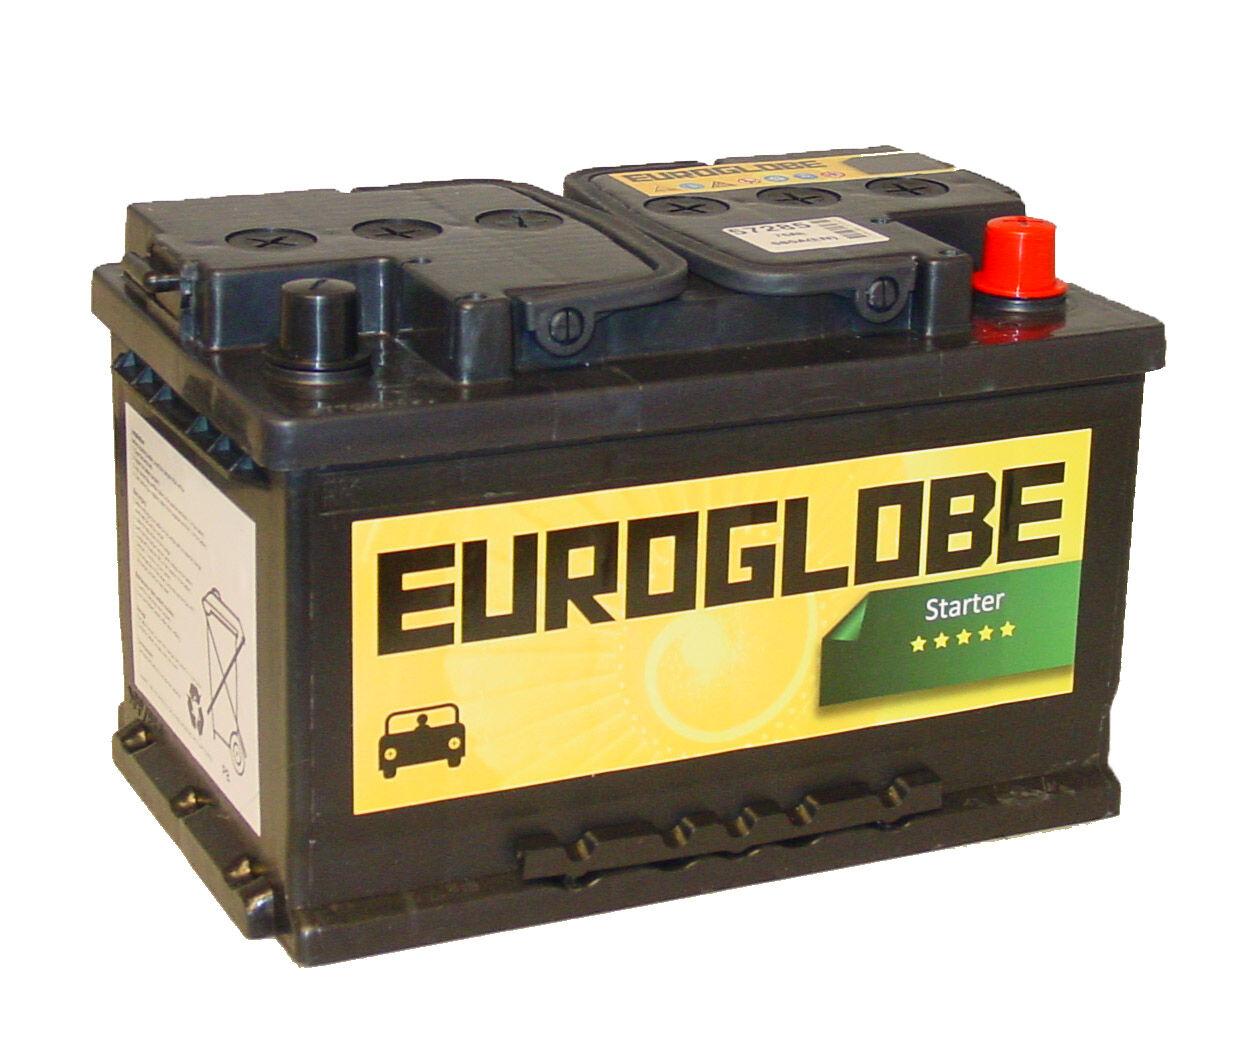 Euroglobe 57285 75Ah Startbatteri 680CcA - Bestselger! 278x175x175mm